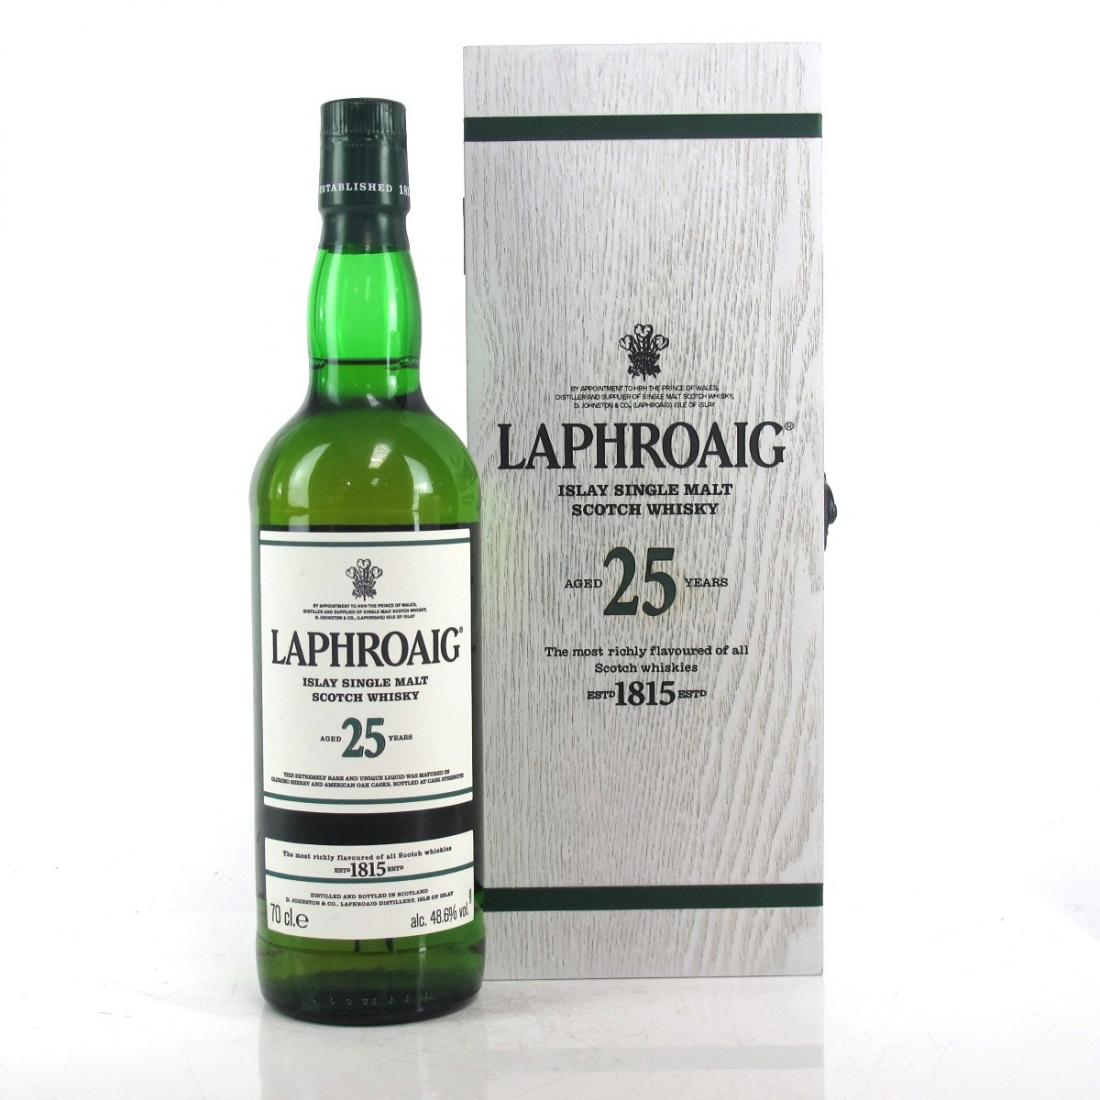 Laphroaig 25 Year Old 2016 Edition